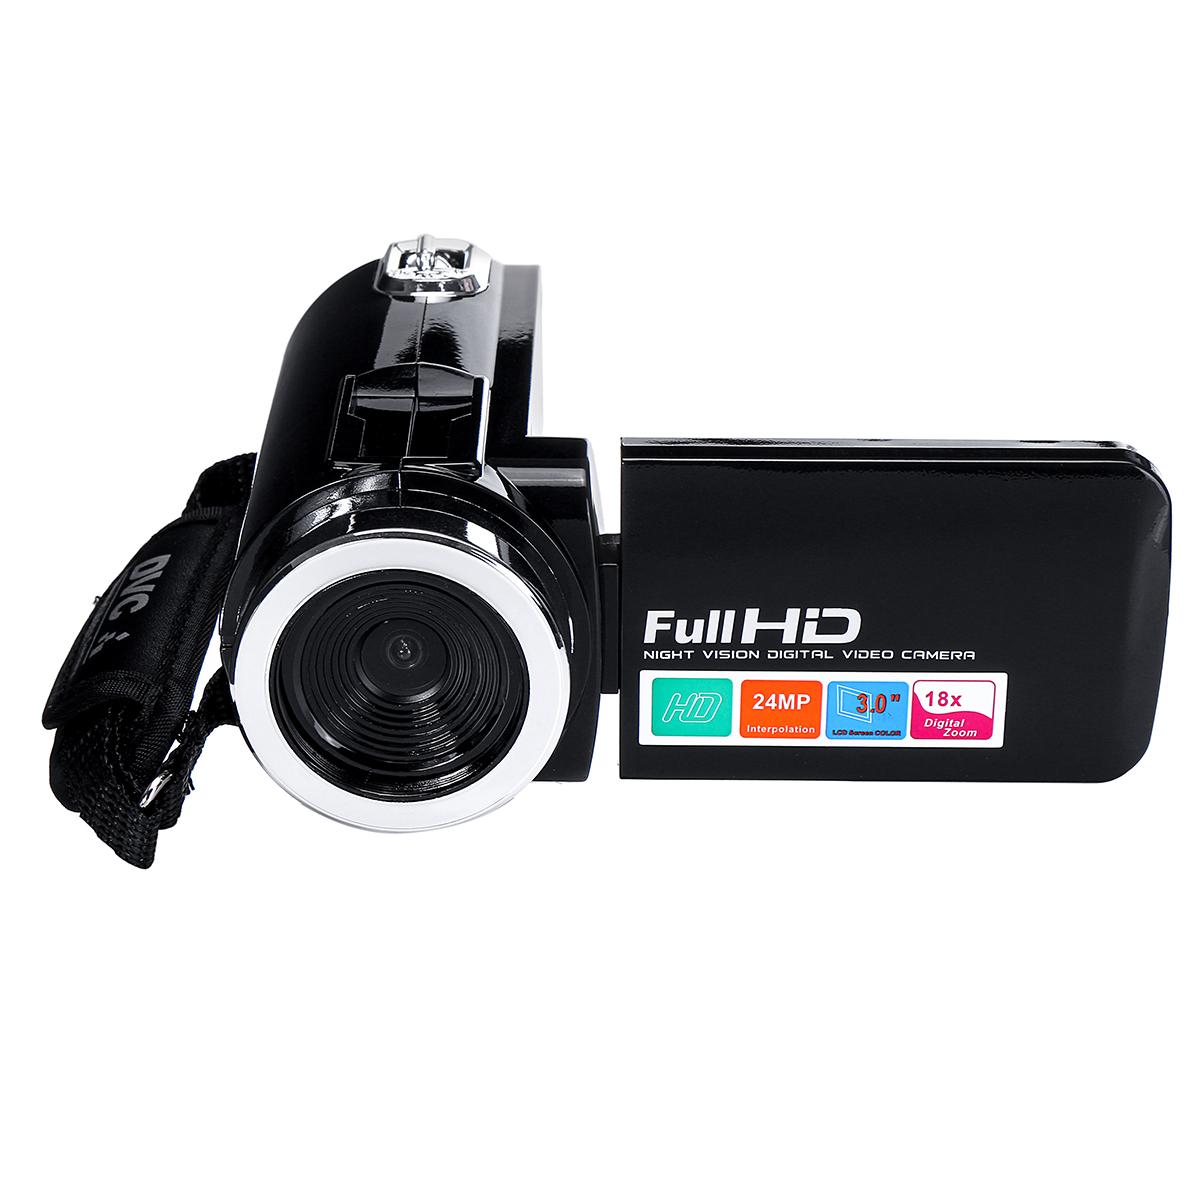 4K Full HD 1080P 24MP 18X Zoom 3 дюймов LCD Цифровая видеокамера Video DV камера 5.0MP CMOS Датчик для видеоблогов YouTu - фото fd63a5e3-479a-432d-a5d3-058cafb16b2e.jpg